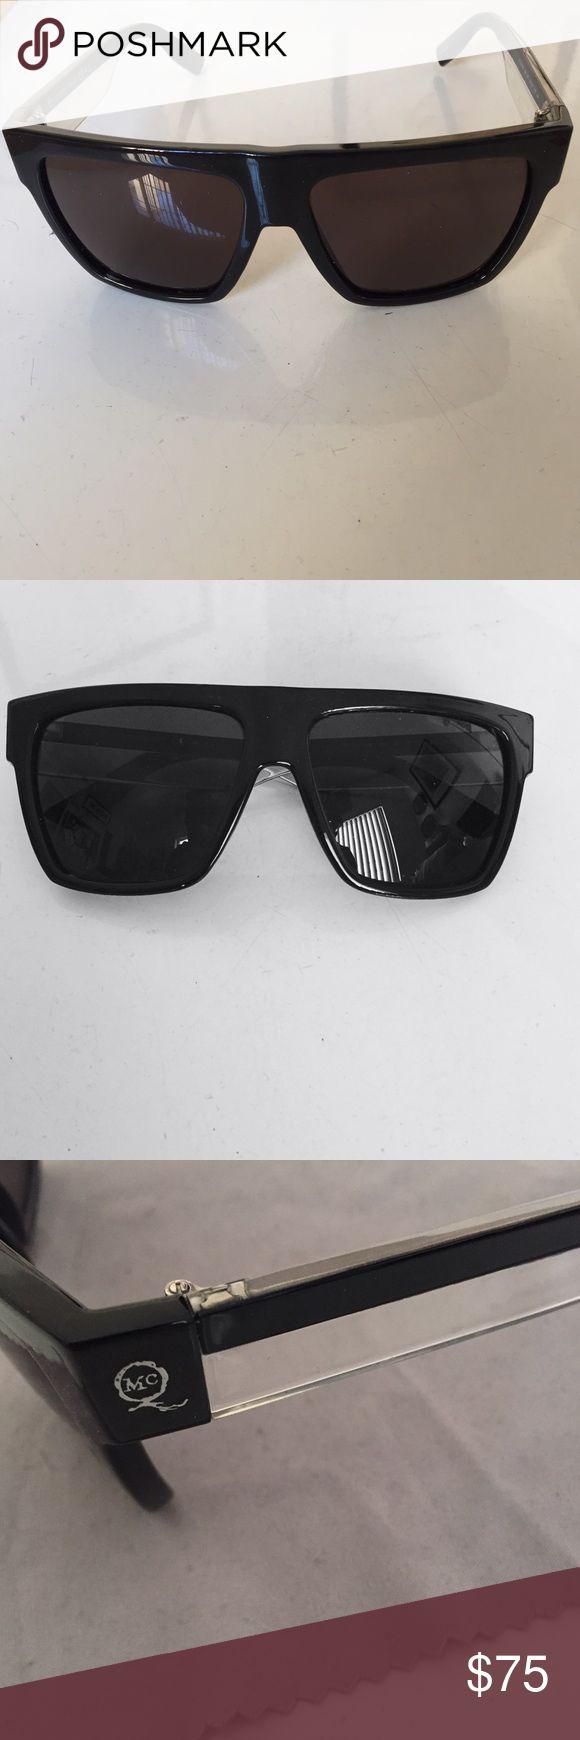 ALEXANDER MCQUEEN sunglasses Alexander McQueen Sunglasses (NEW) Never used UNISEX Plastic Frame/Gloss  Polycarbonate Lens (Black)  No case Regular price $200  NO TRADES NO HOLDS DO NOT LOWBALL ME! Alexander McQueen Accessories Sunglasses